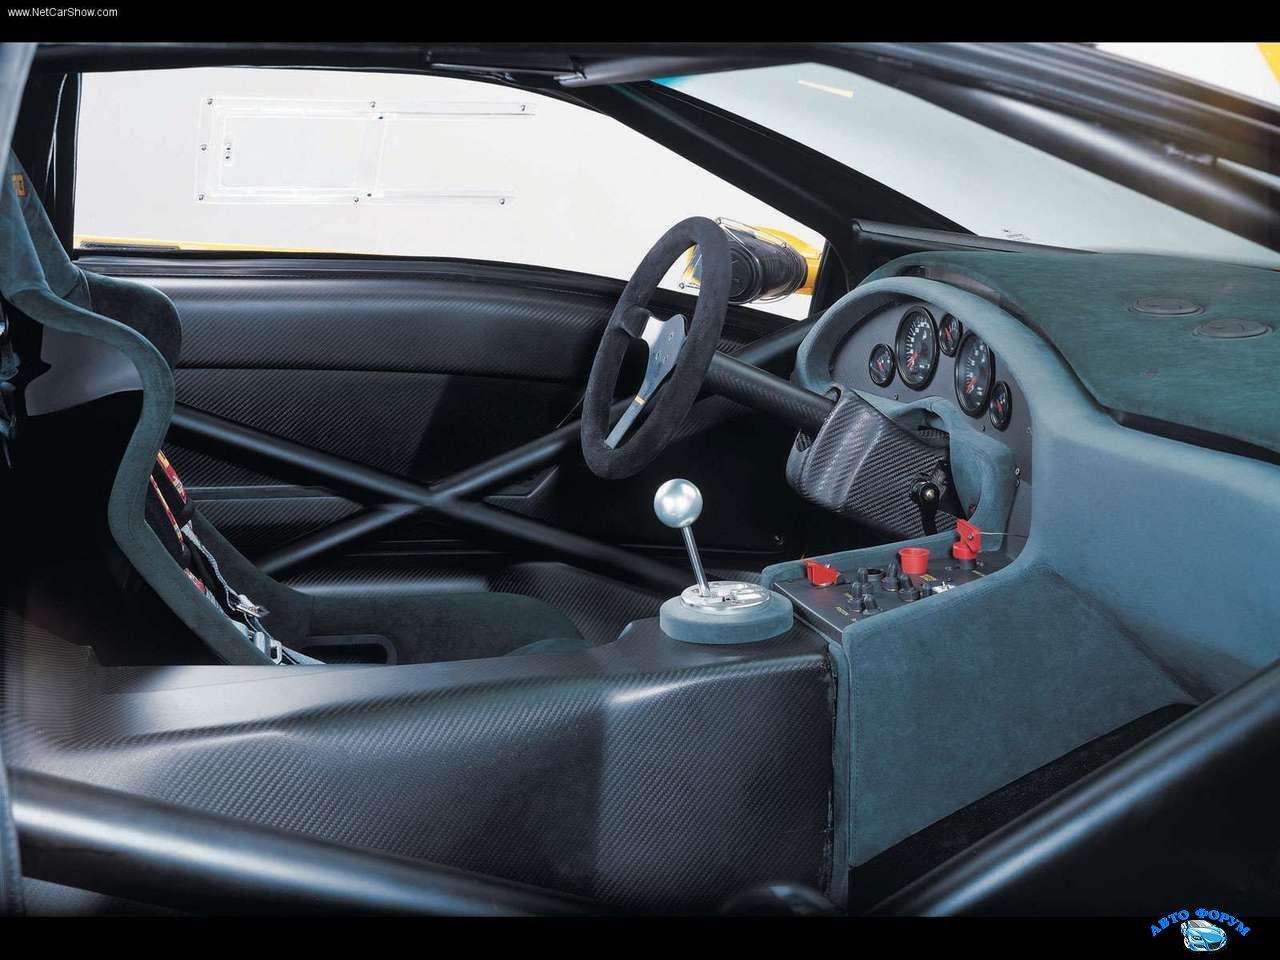 Lamborghini-Diablo_GTR_1999_1280x960_wallpaper_07.jpg